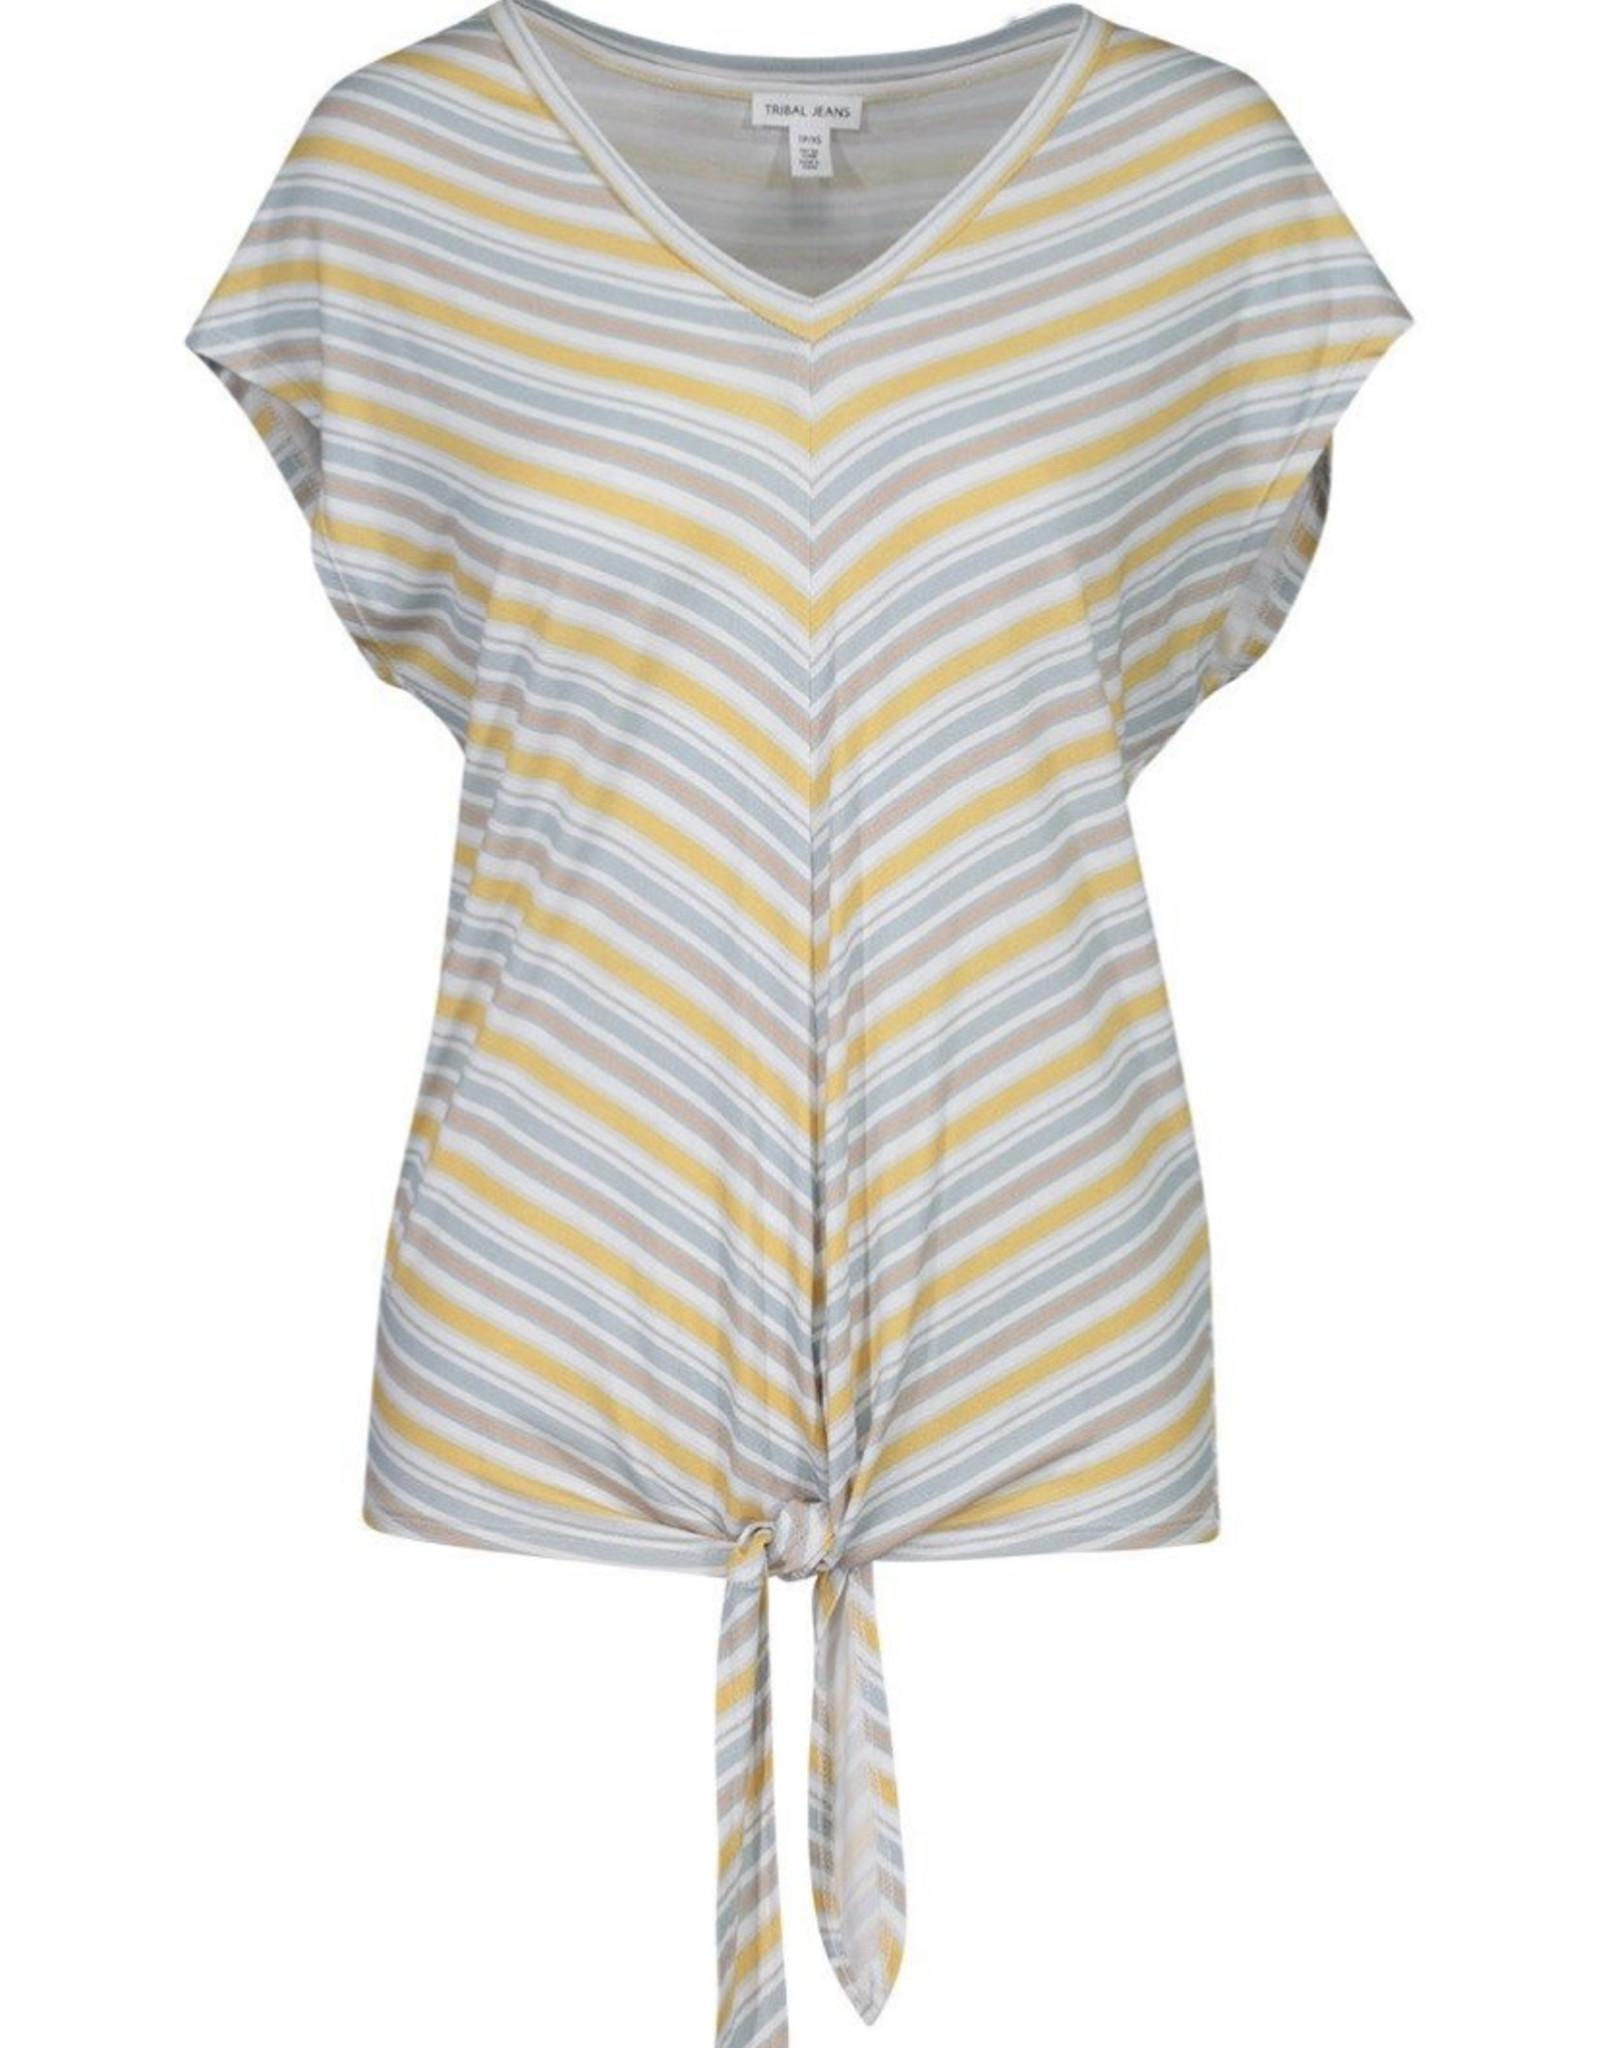 S/s top front tie stripes